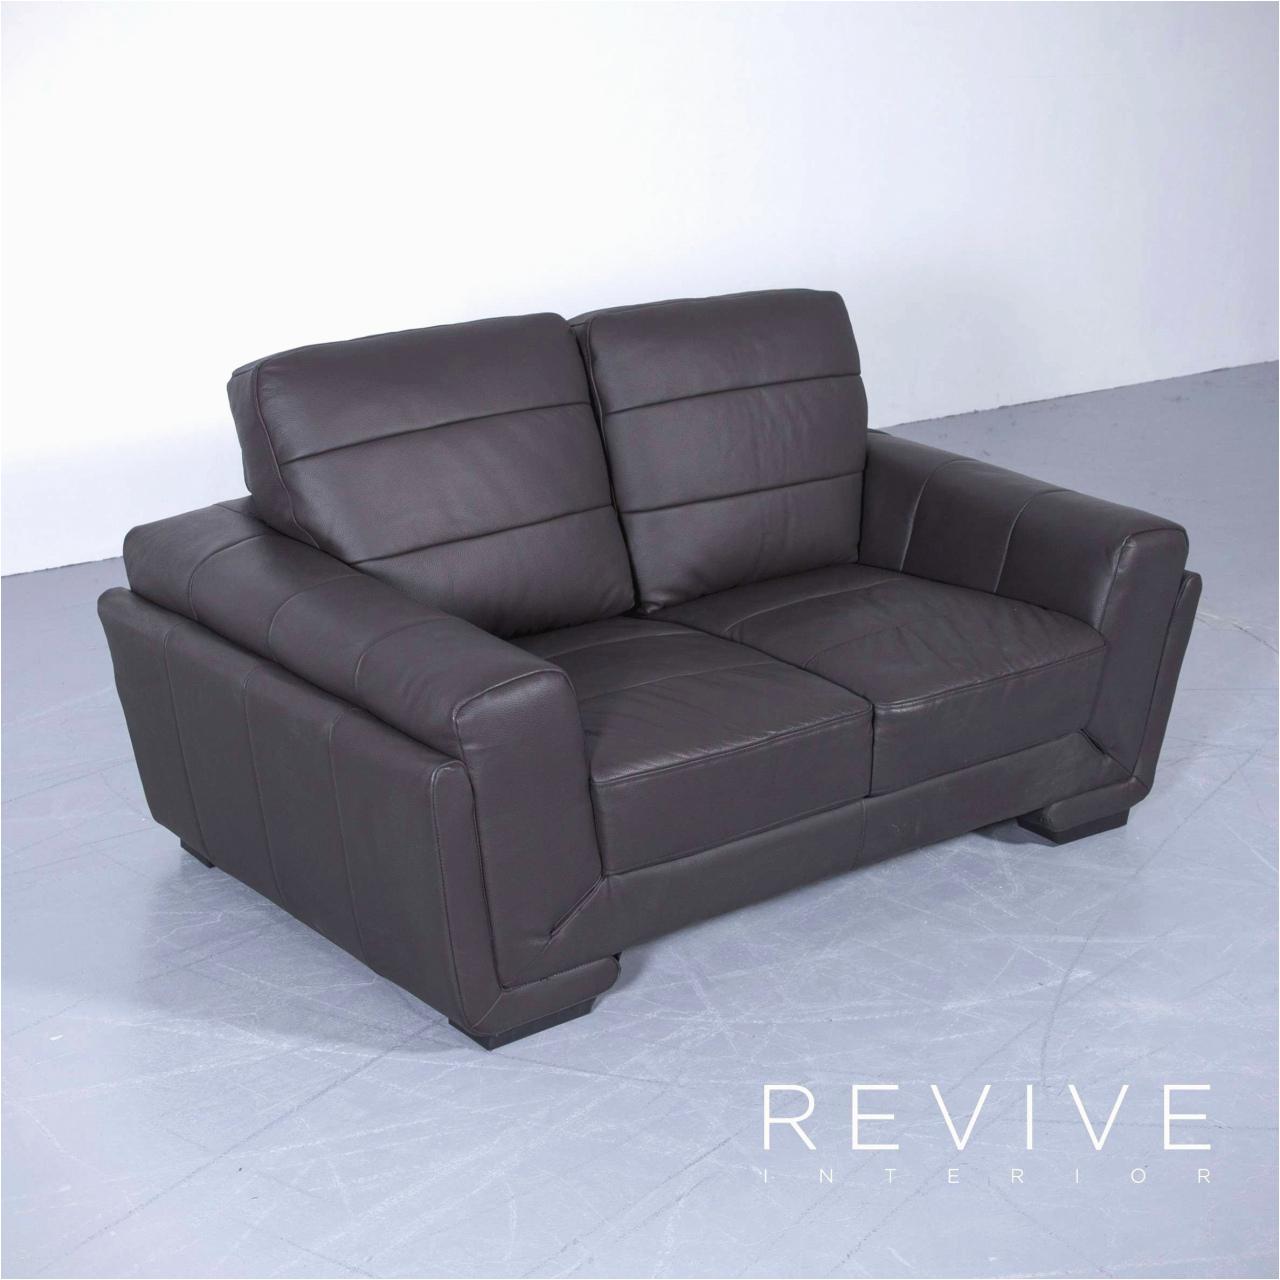 Best sofa Design sofa Bed Couch sofa Bauen Inspirierend sofa Design Best